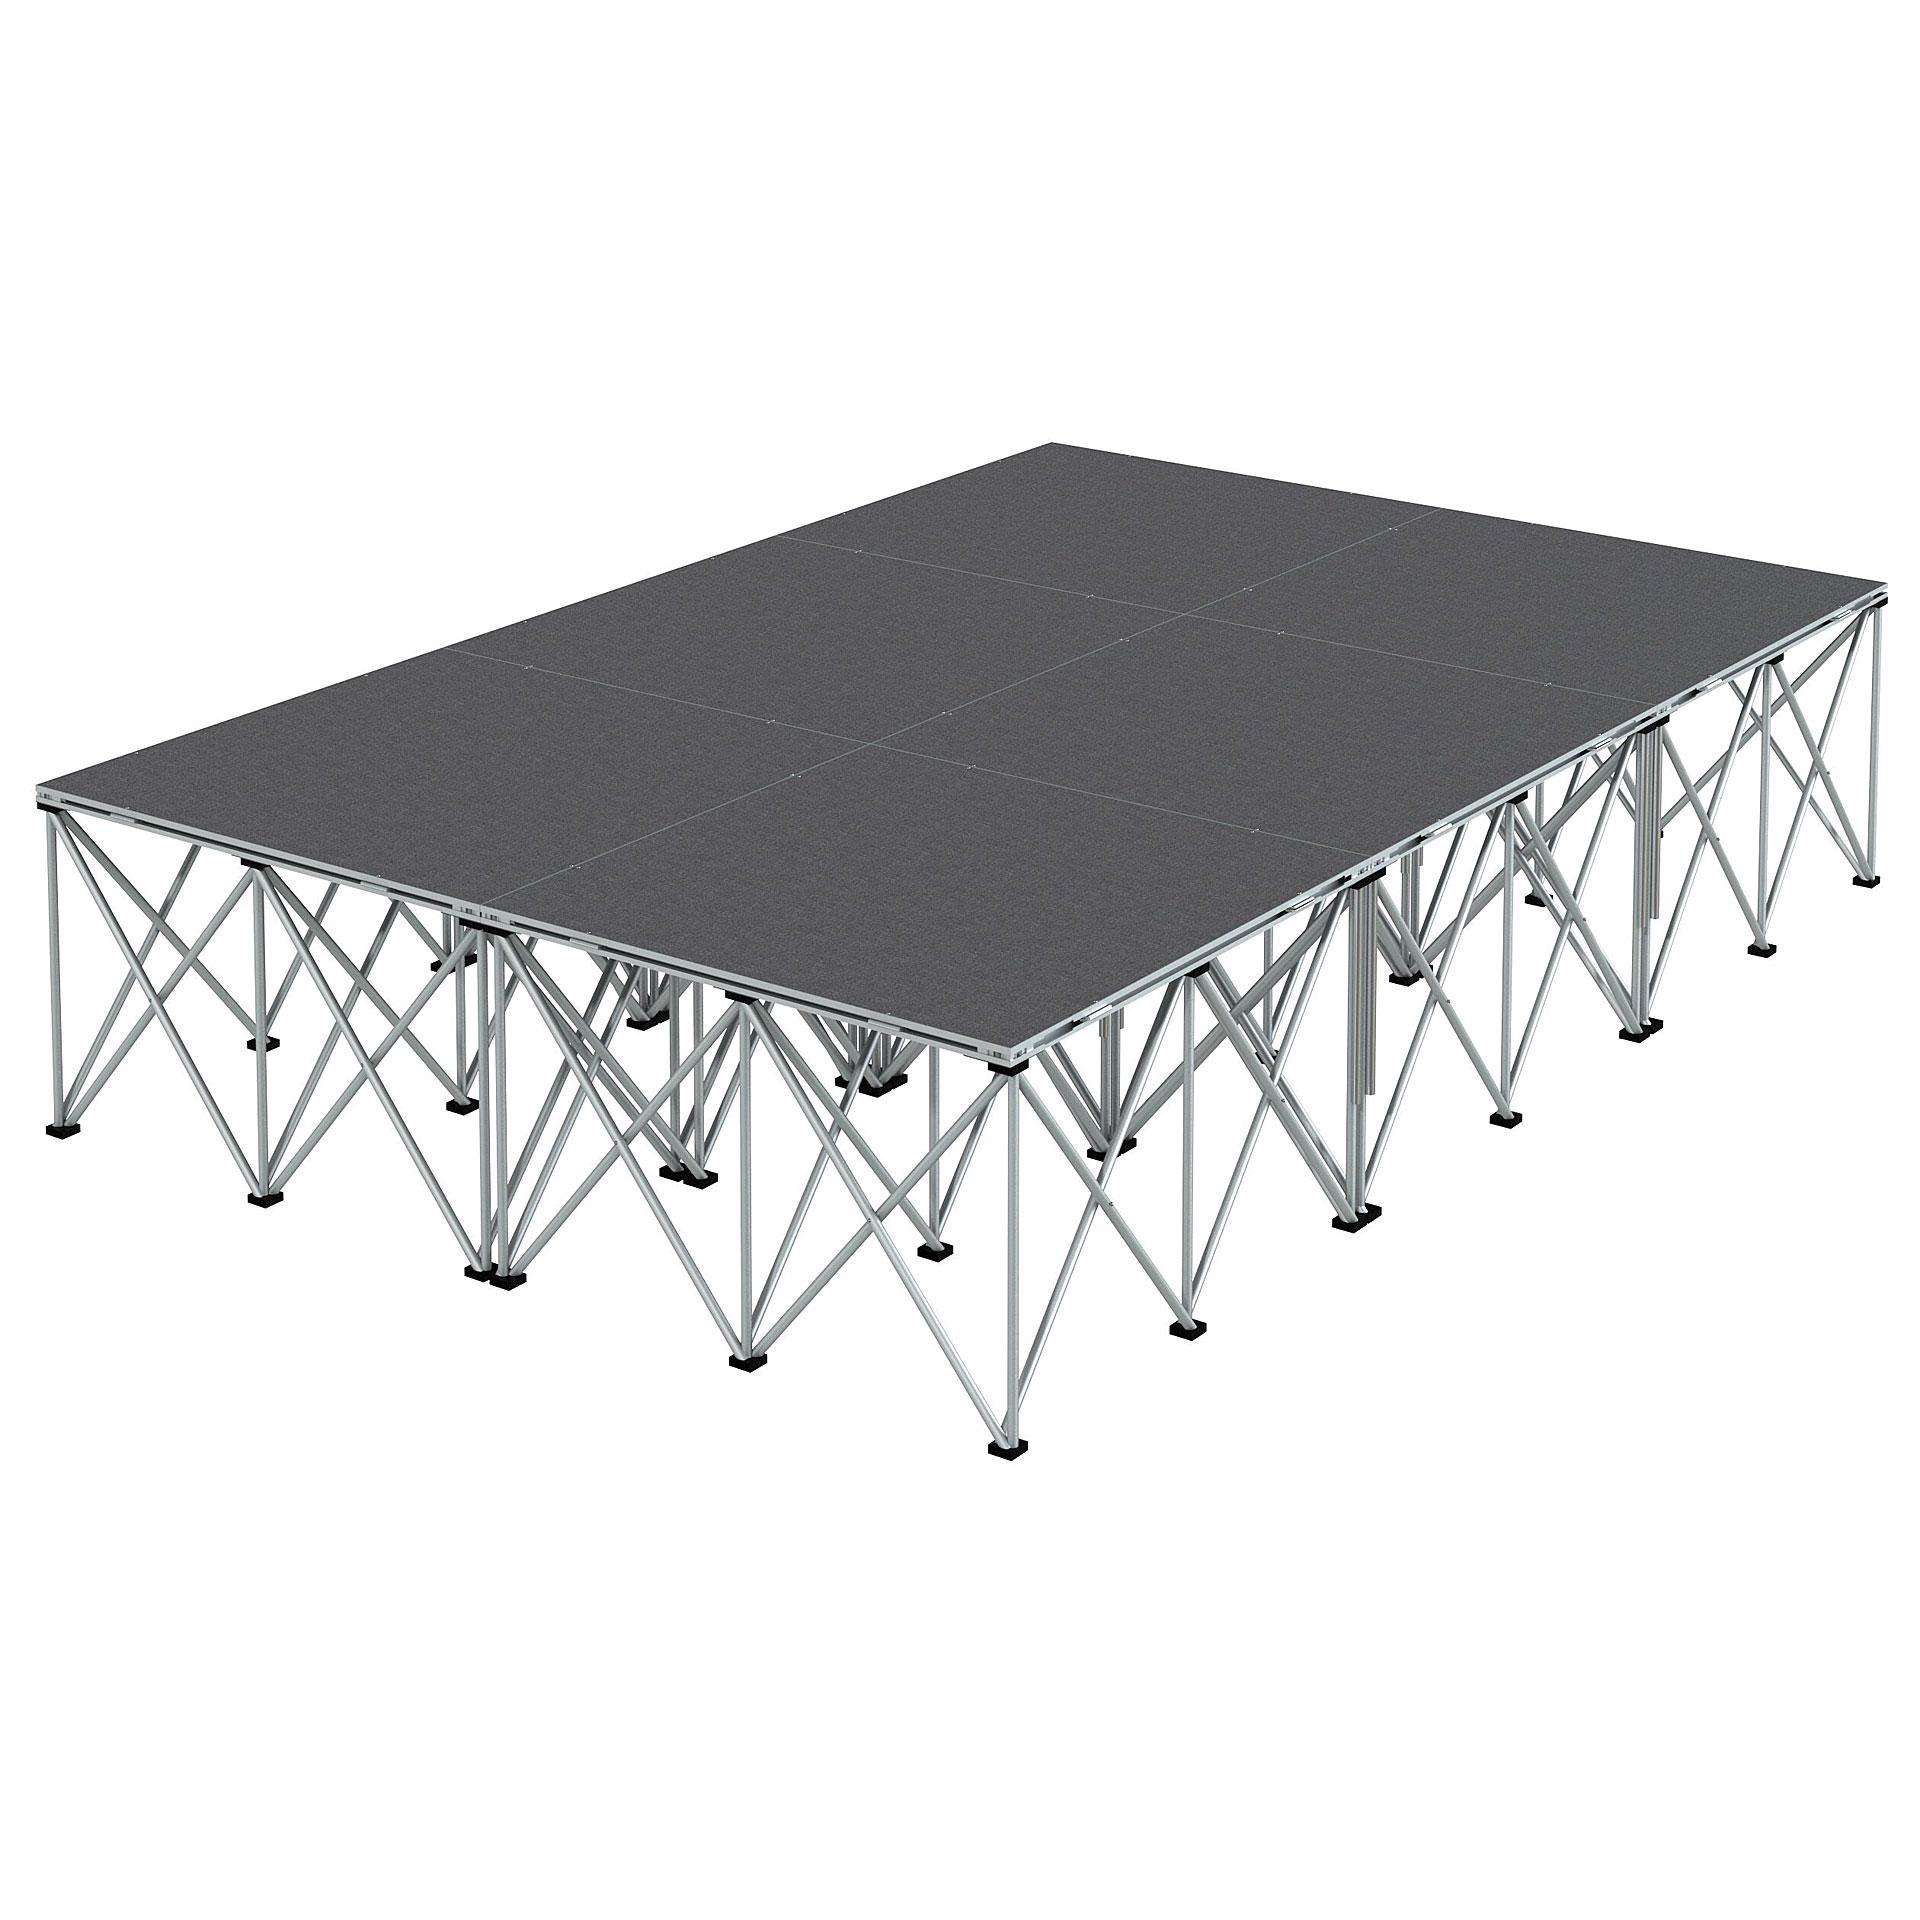 intellistage b hne 2 x 3 m teppich stage platform. Black Bedroom Furniture Sets. Home Design Ideas